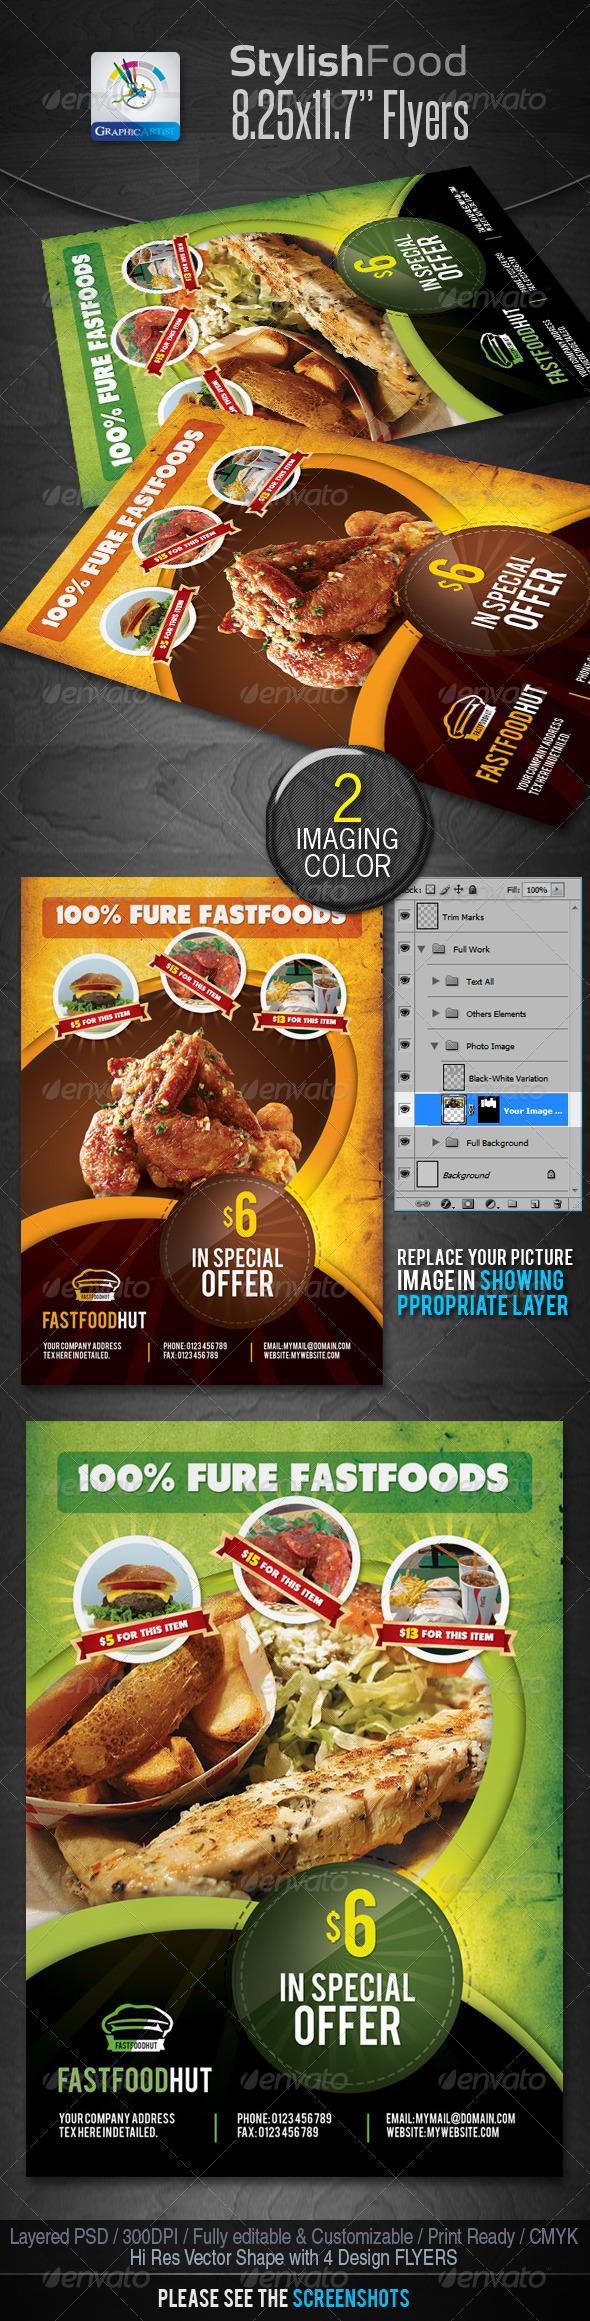 Stylish Foods Flyers - Restaurant Flyers